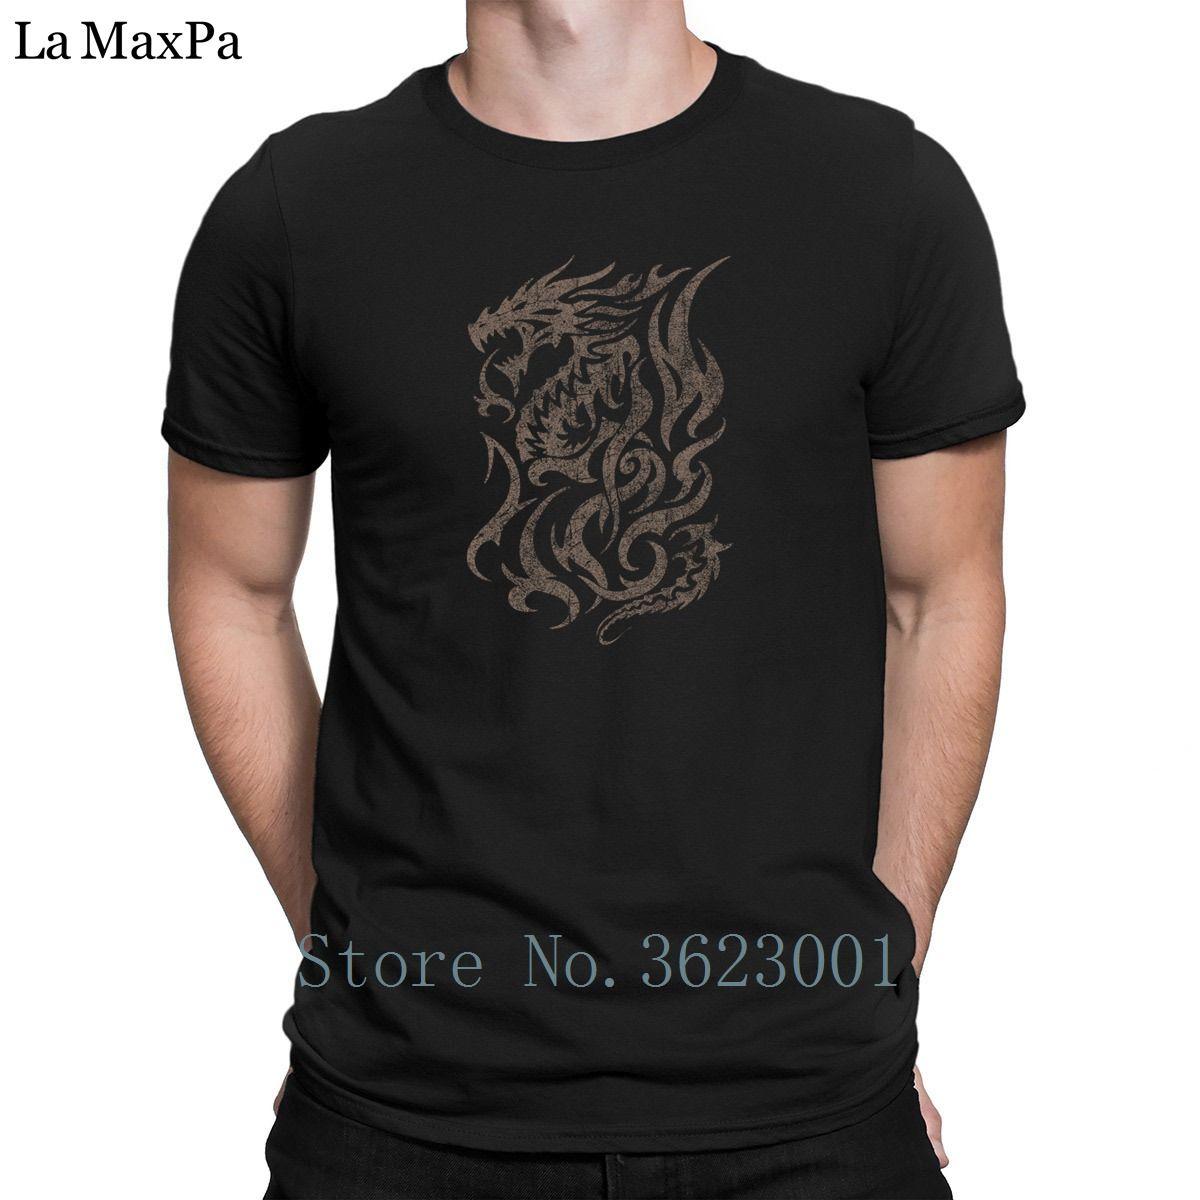 33e7249b0 Design Natural Tshirt Man Vintage Tribal Dragon Mens T Shirt Cotton Graphic  T Shirt Man Super Tee Shirt For Mens 2018 Awesome Super Cool T Shirts And T  ...